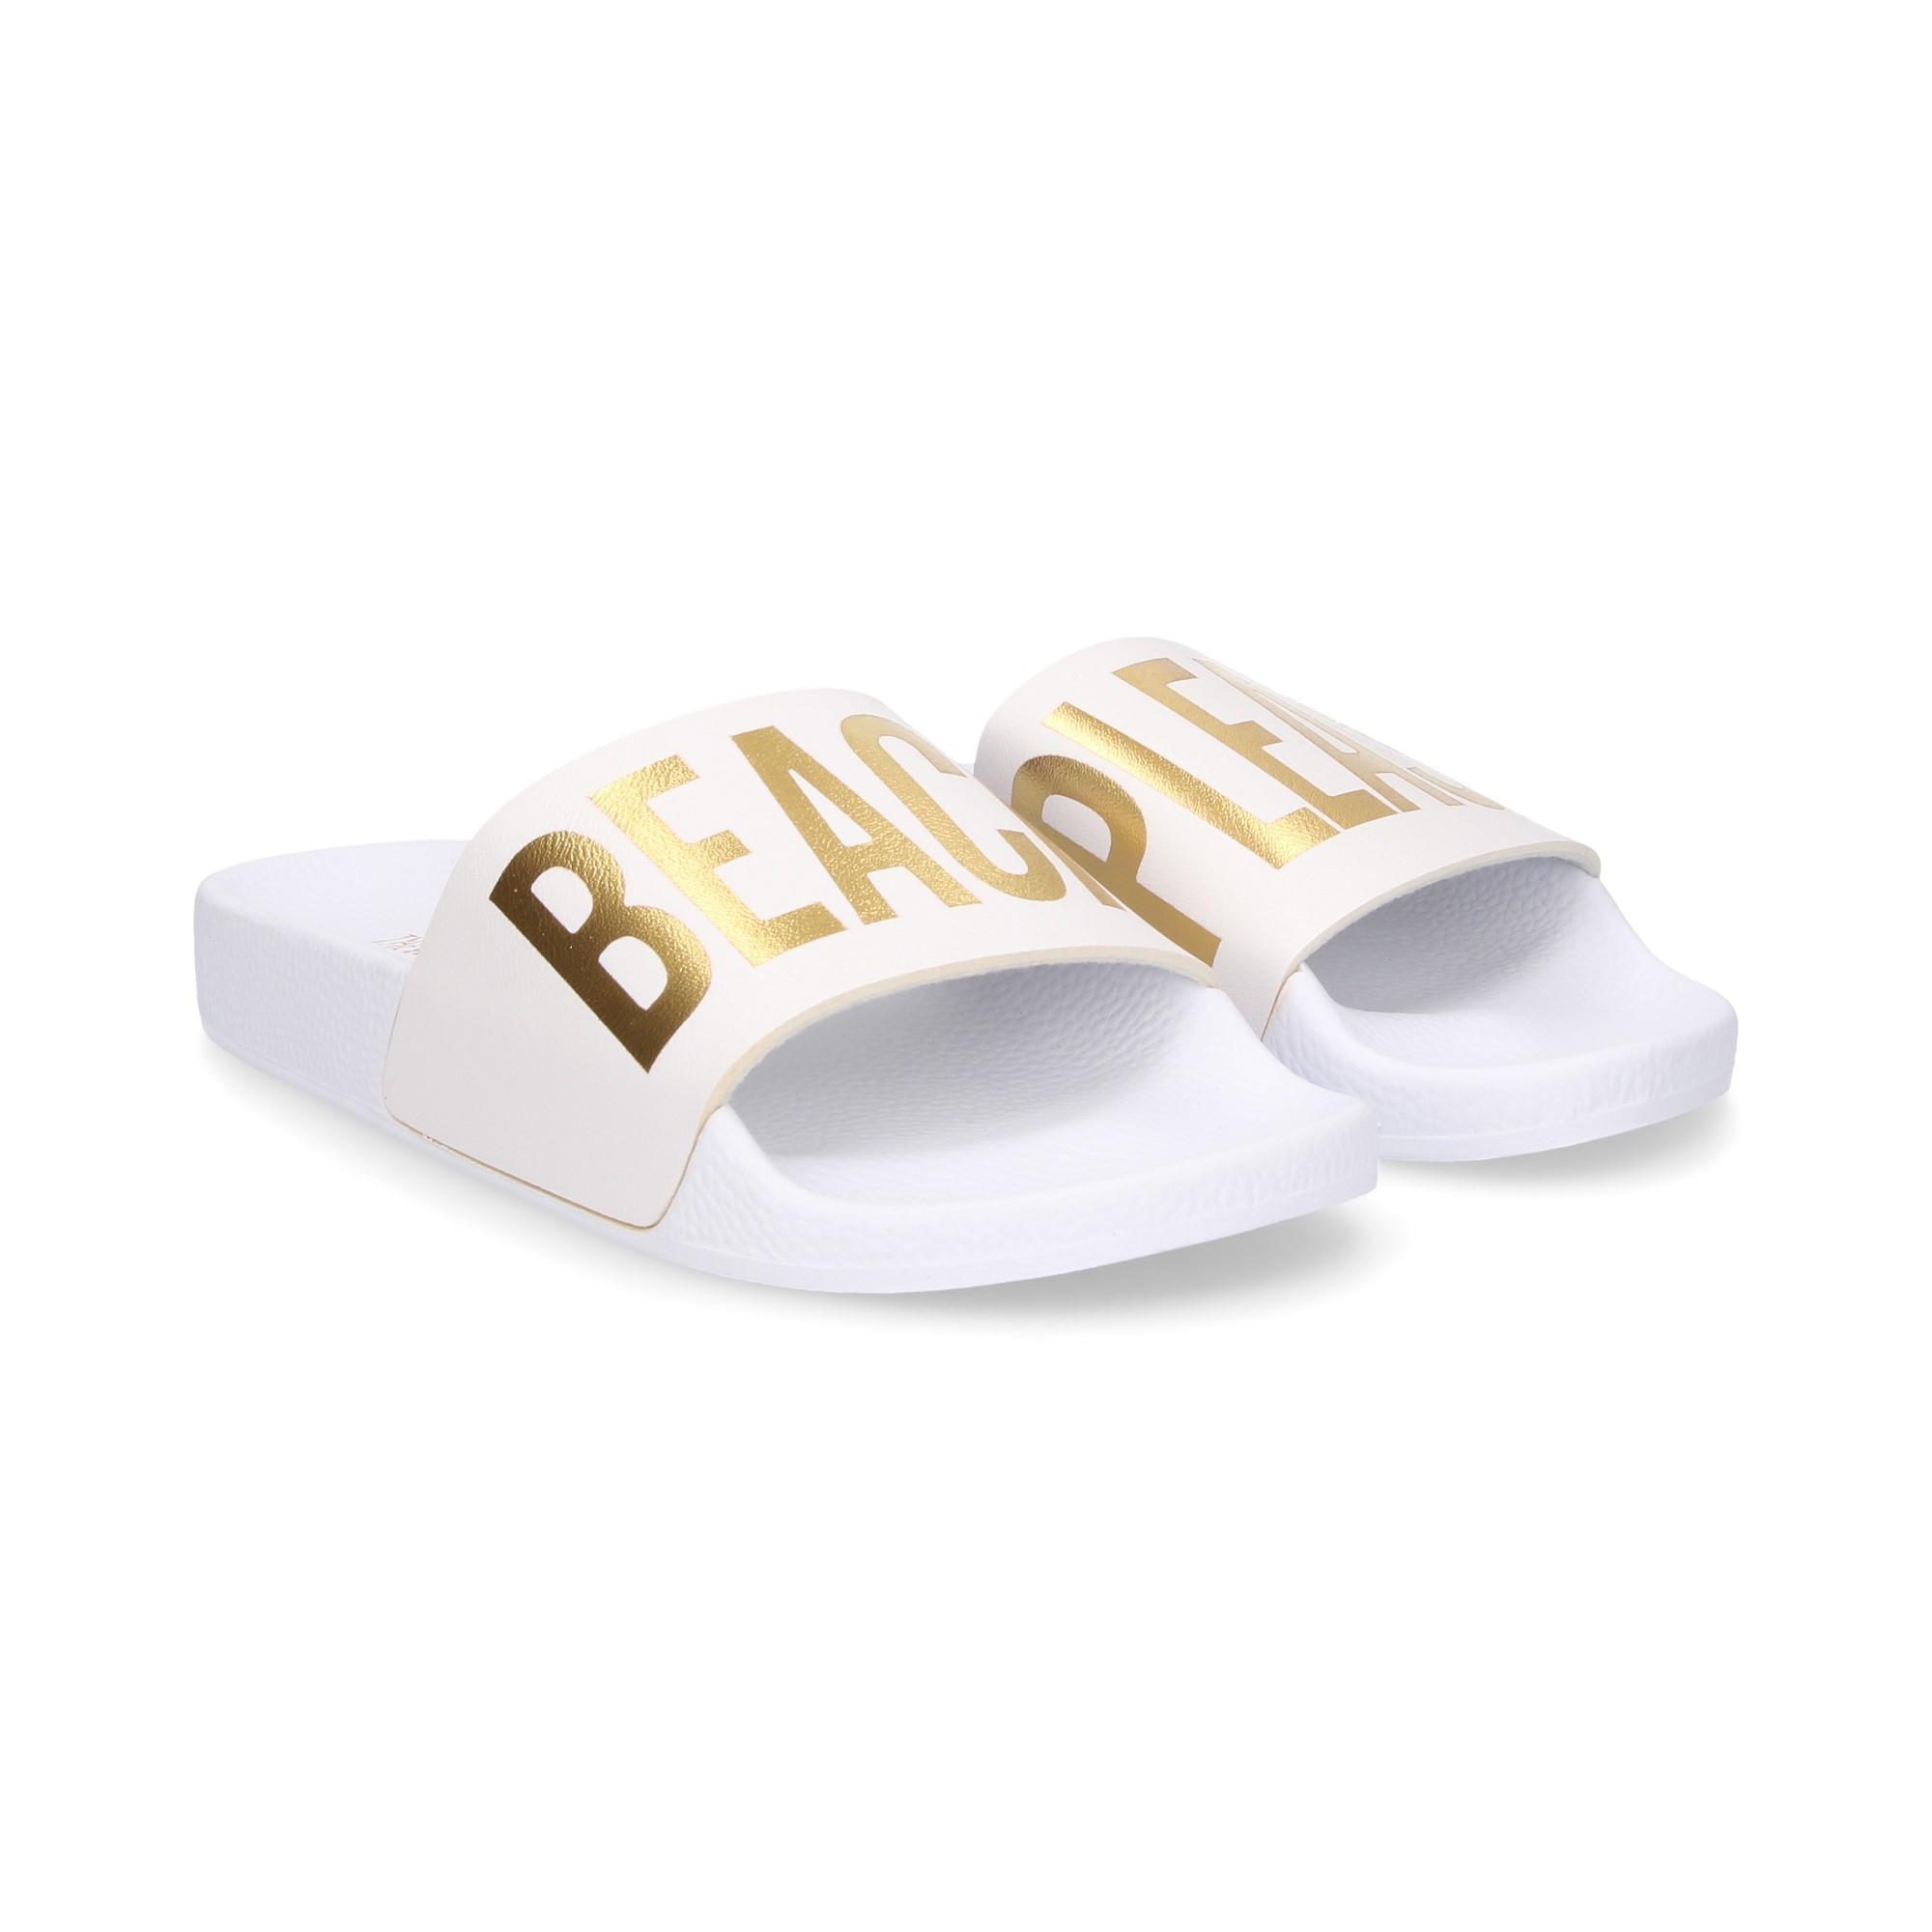 pala-beach-please-blanco